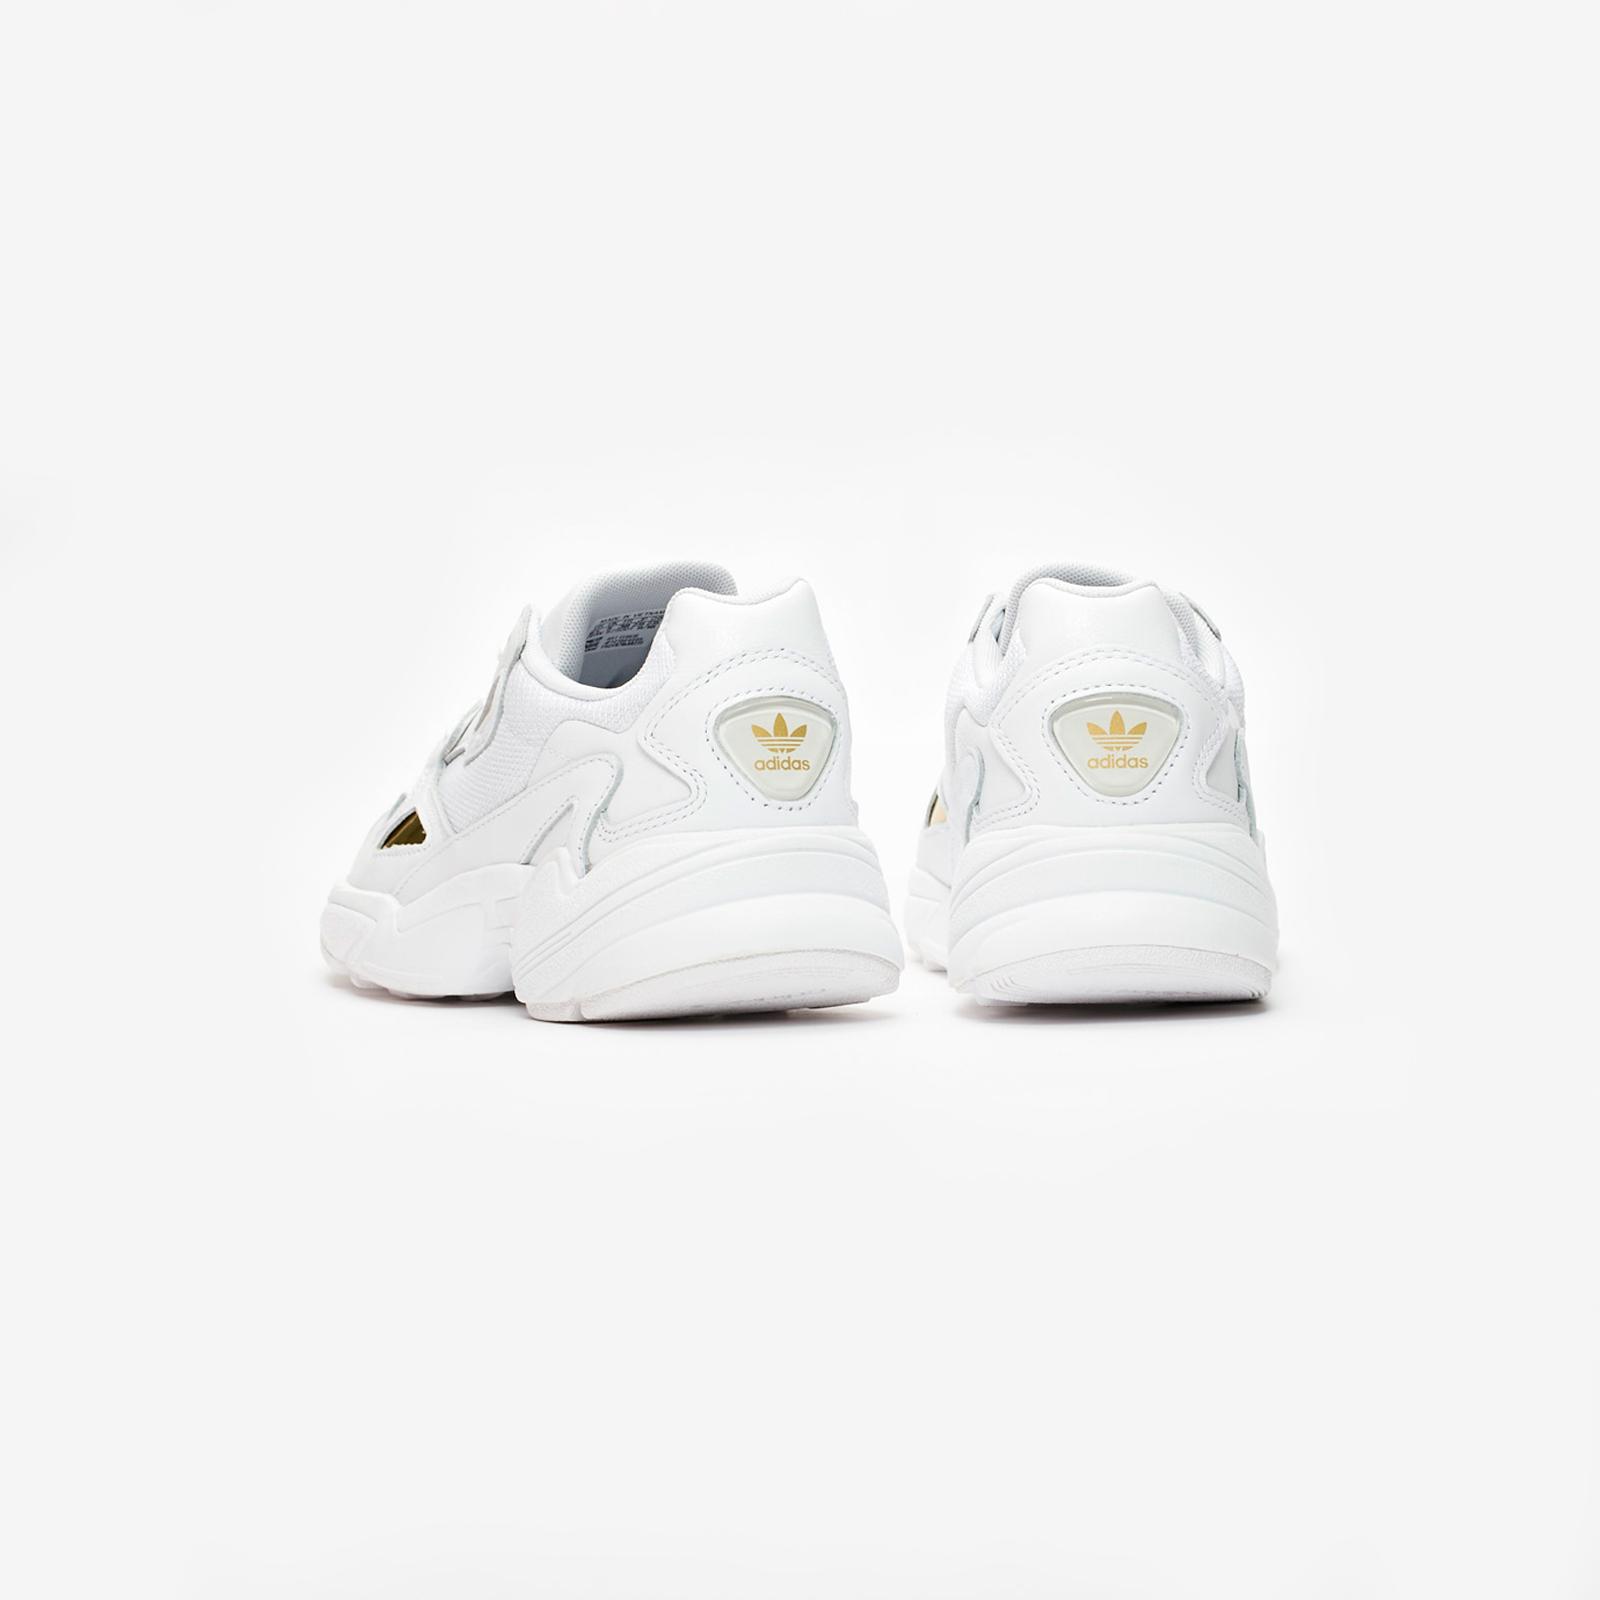 save off a8f8f bf9f1 adidas Originals Falcon W adidas Originals Falcon W ...